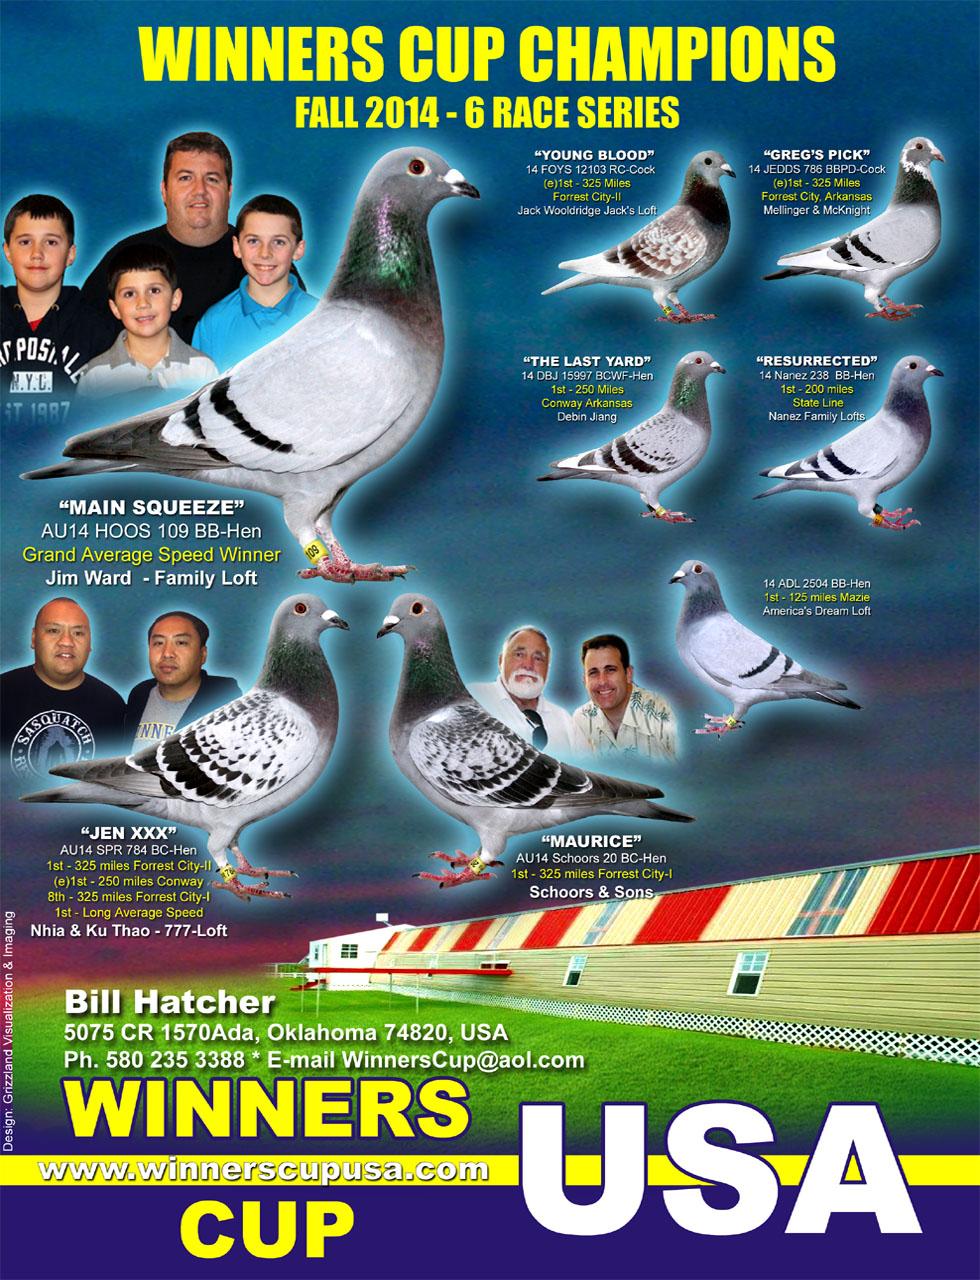 WINNERSCUP USA 4 RACE SERIES